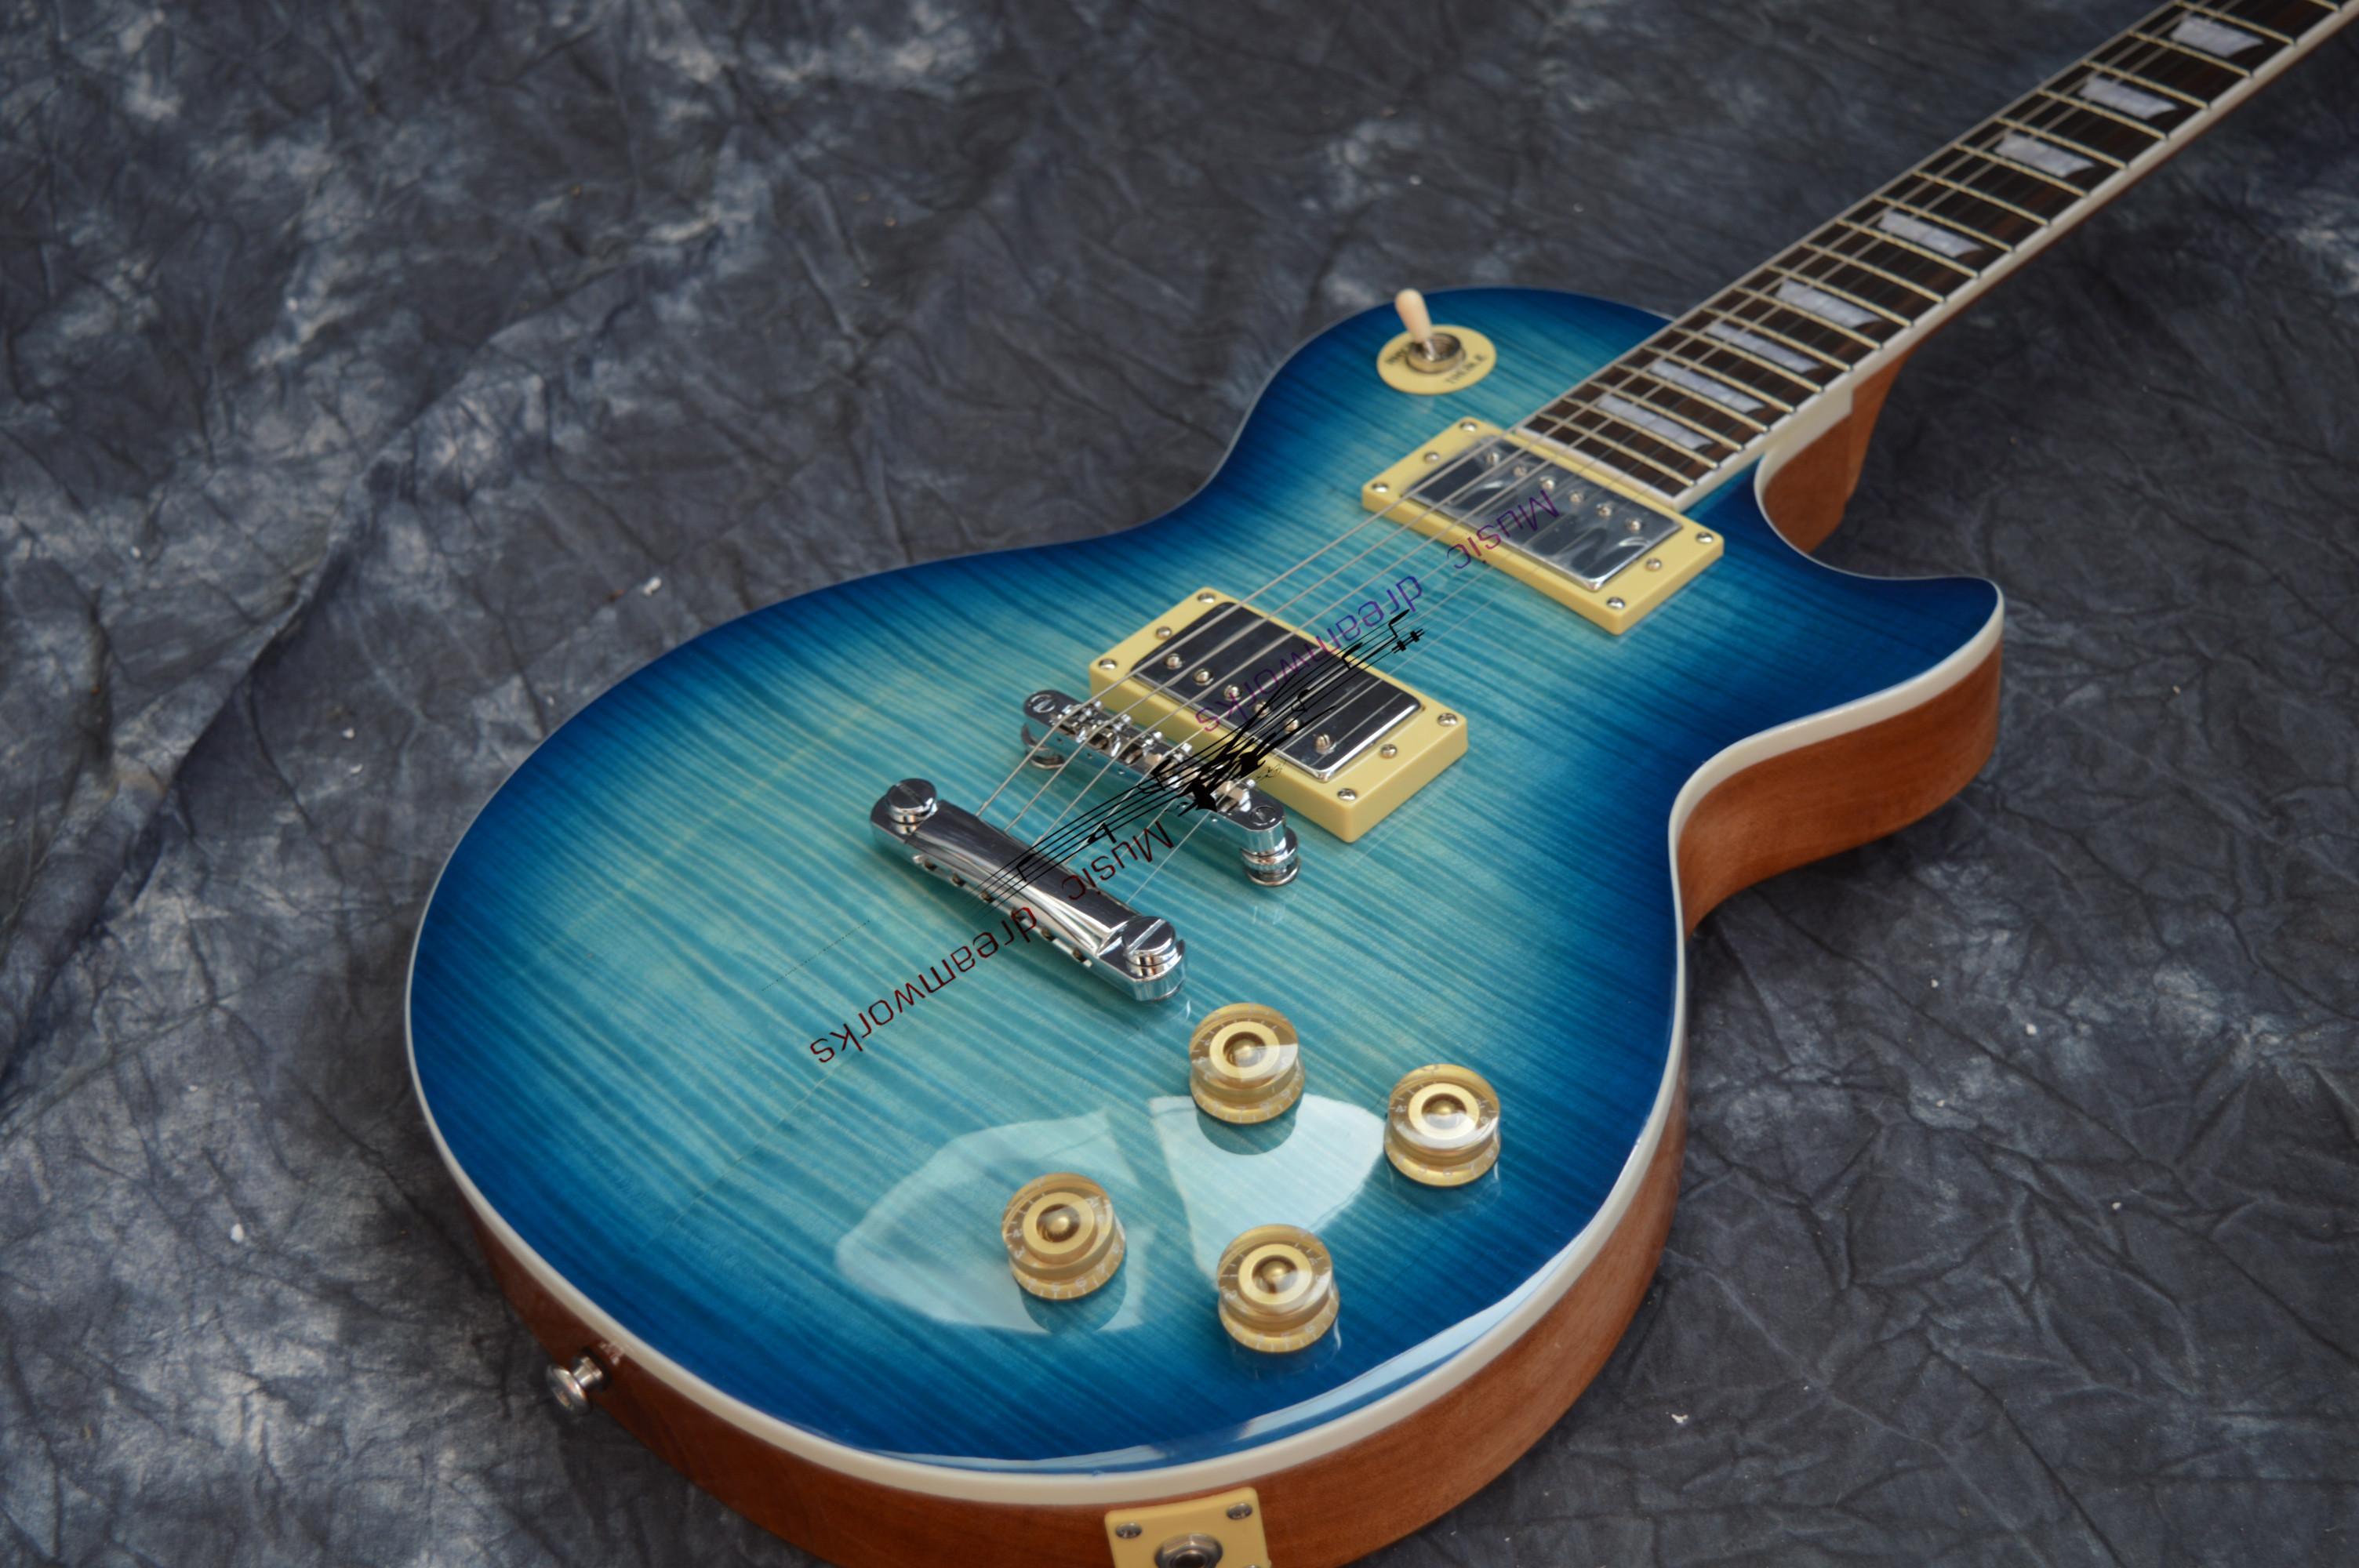 China E-Gitarre OEM Geschäft LP Standard-E-Gitarren-Himmelblau gradien Farbe Les VOS 6 Saiten Elektro-Paul-Gitarre